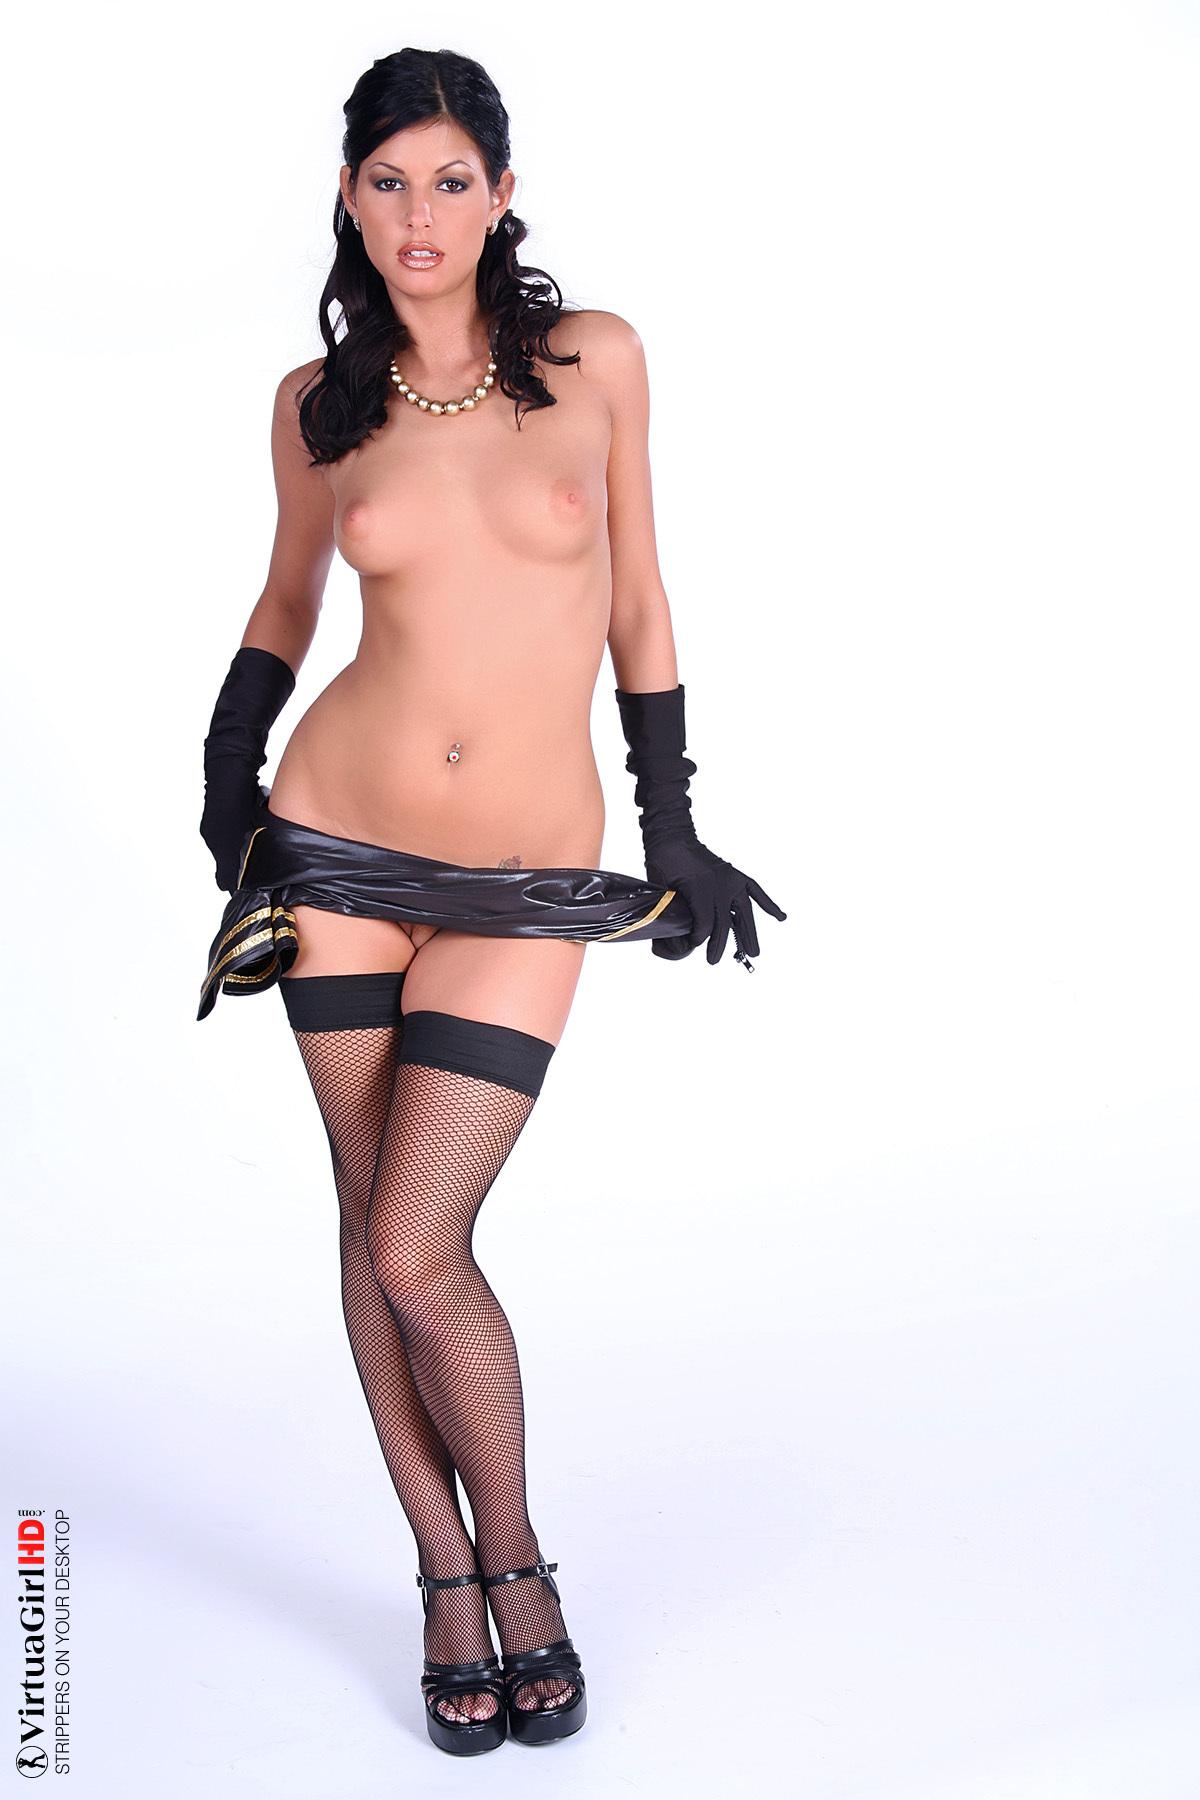 erotic nude bodyscape wallpaper color splash black